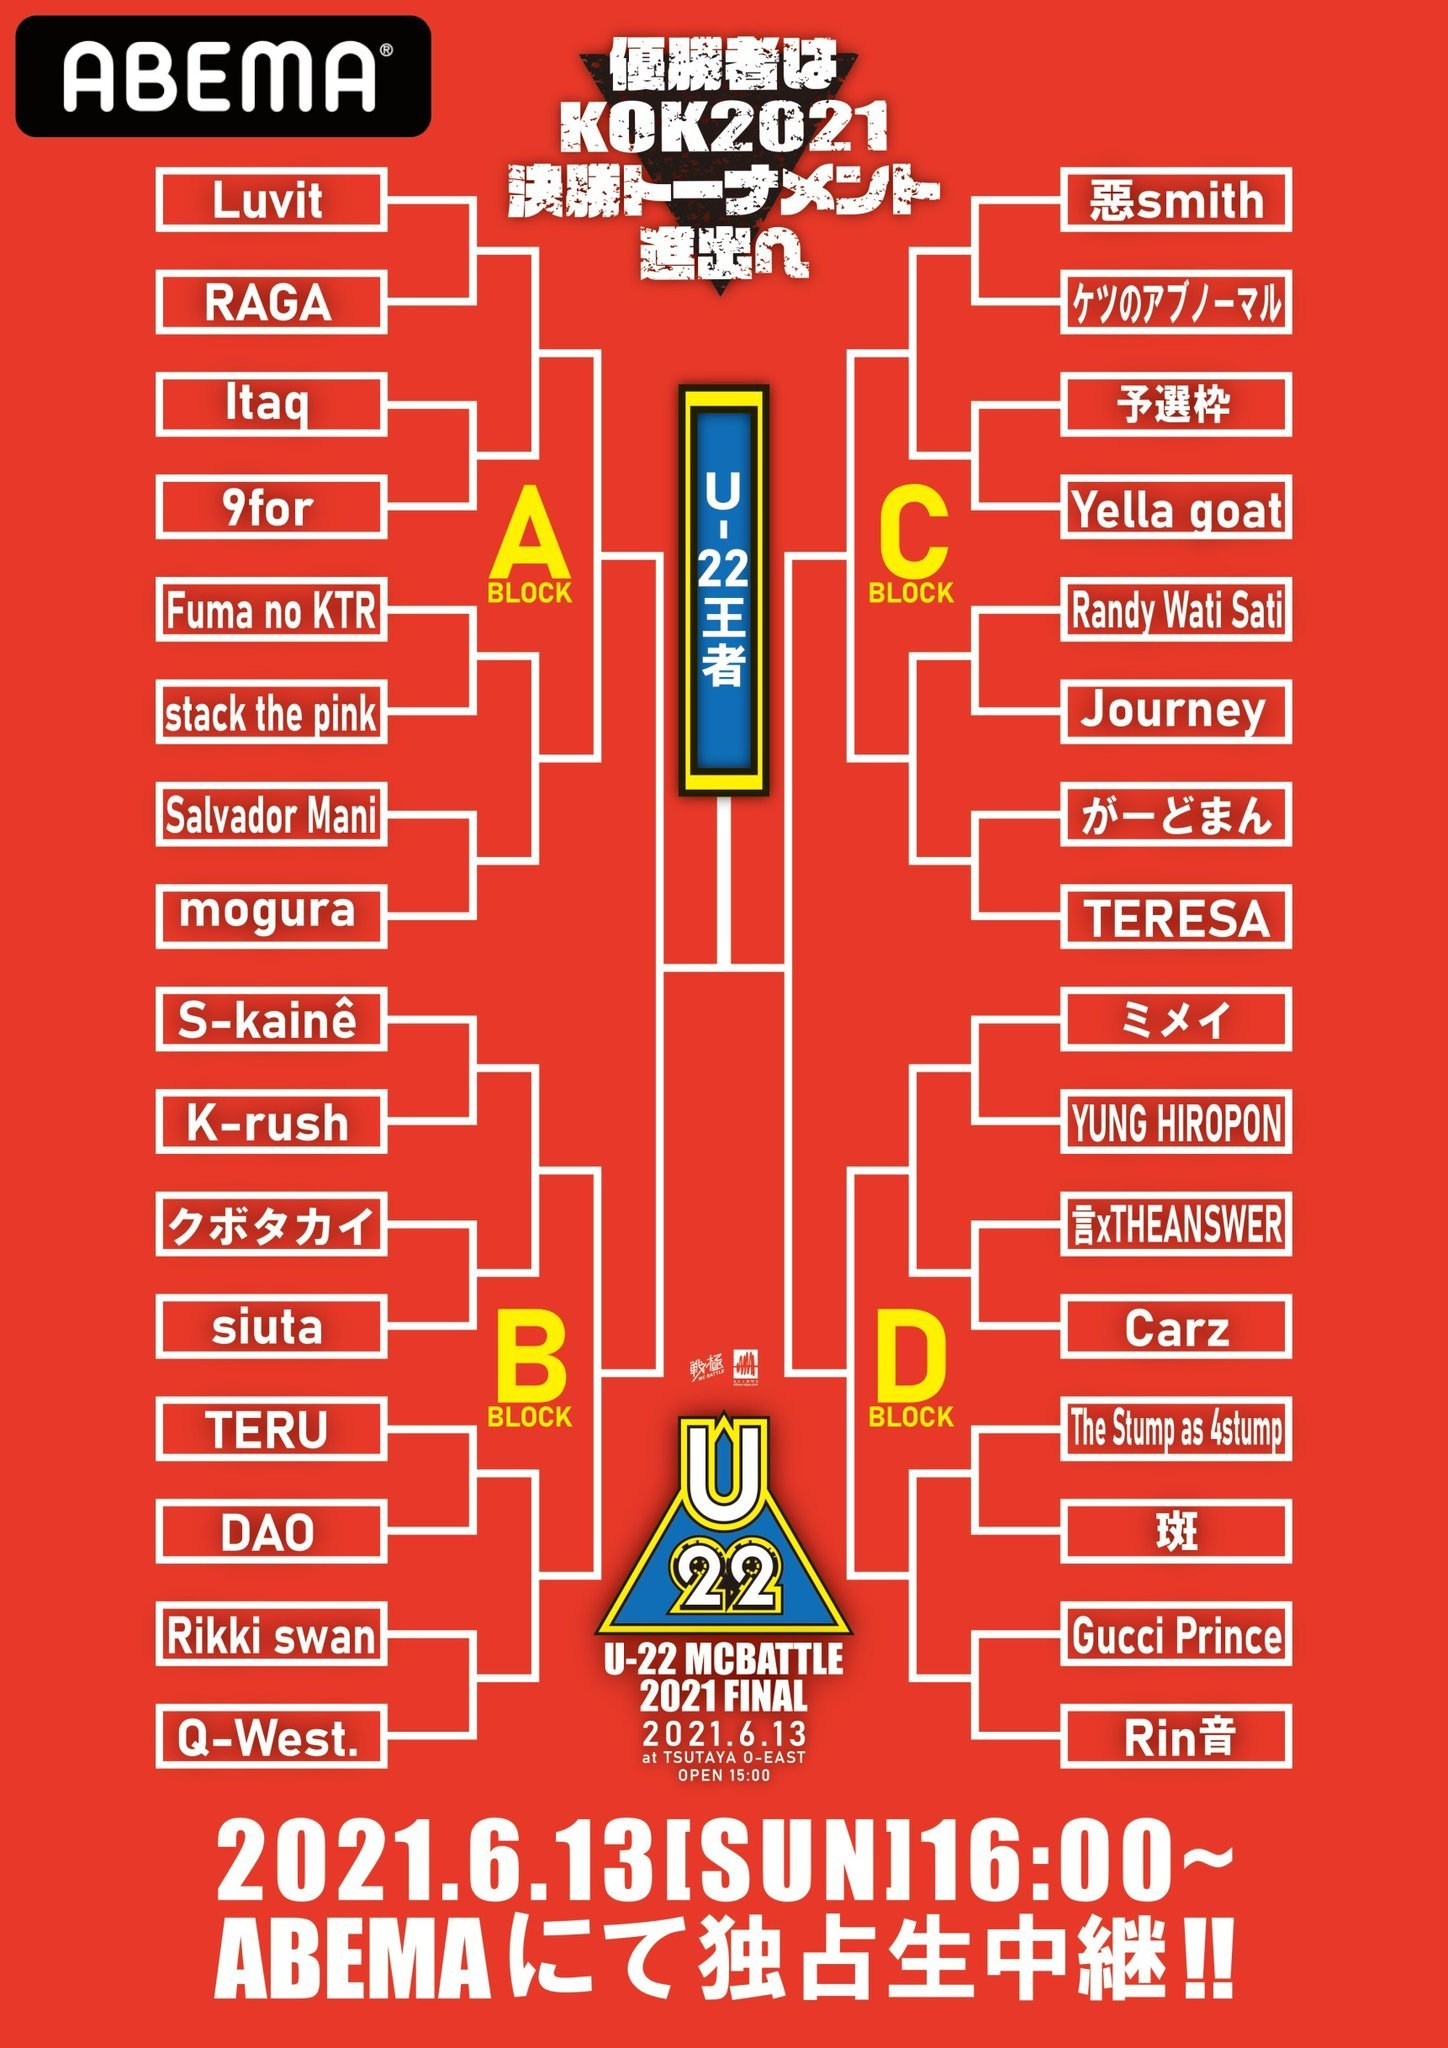 6/13 U-22 MCBATTLE 2021 FINAL abemaで無料配信_e0246863_19254022.jpg